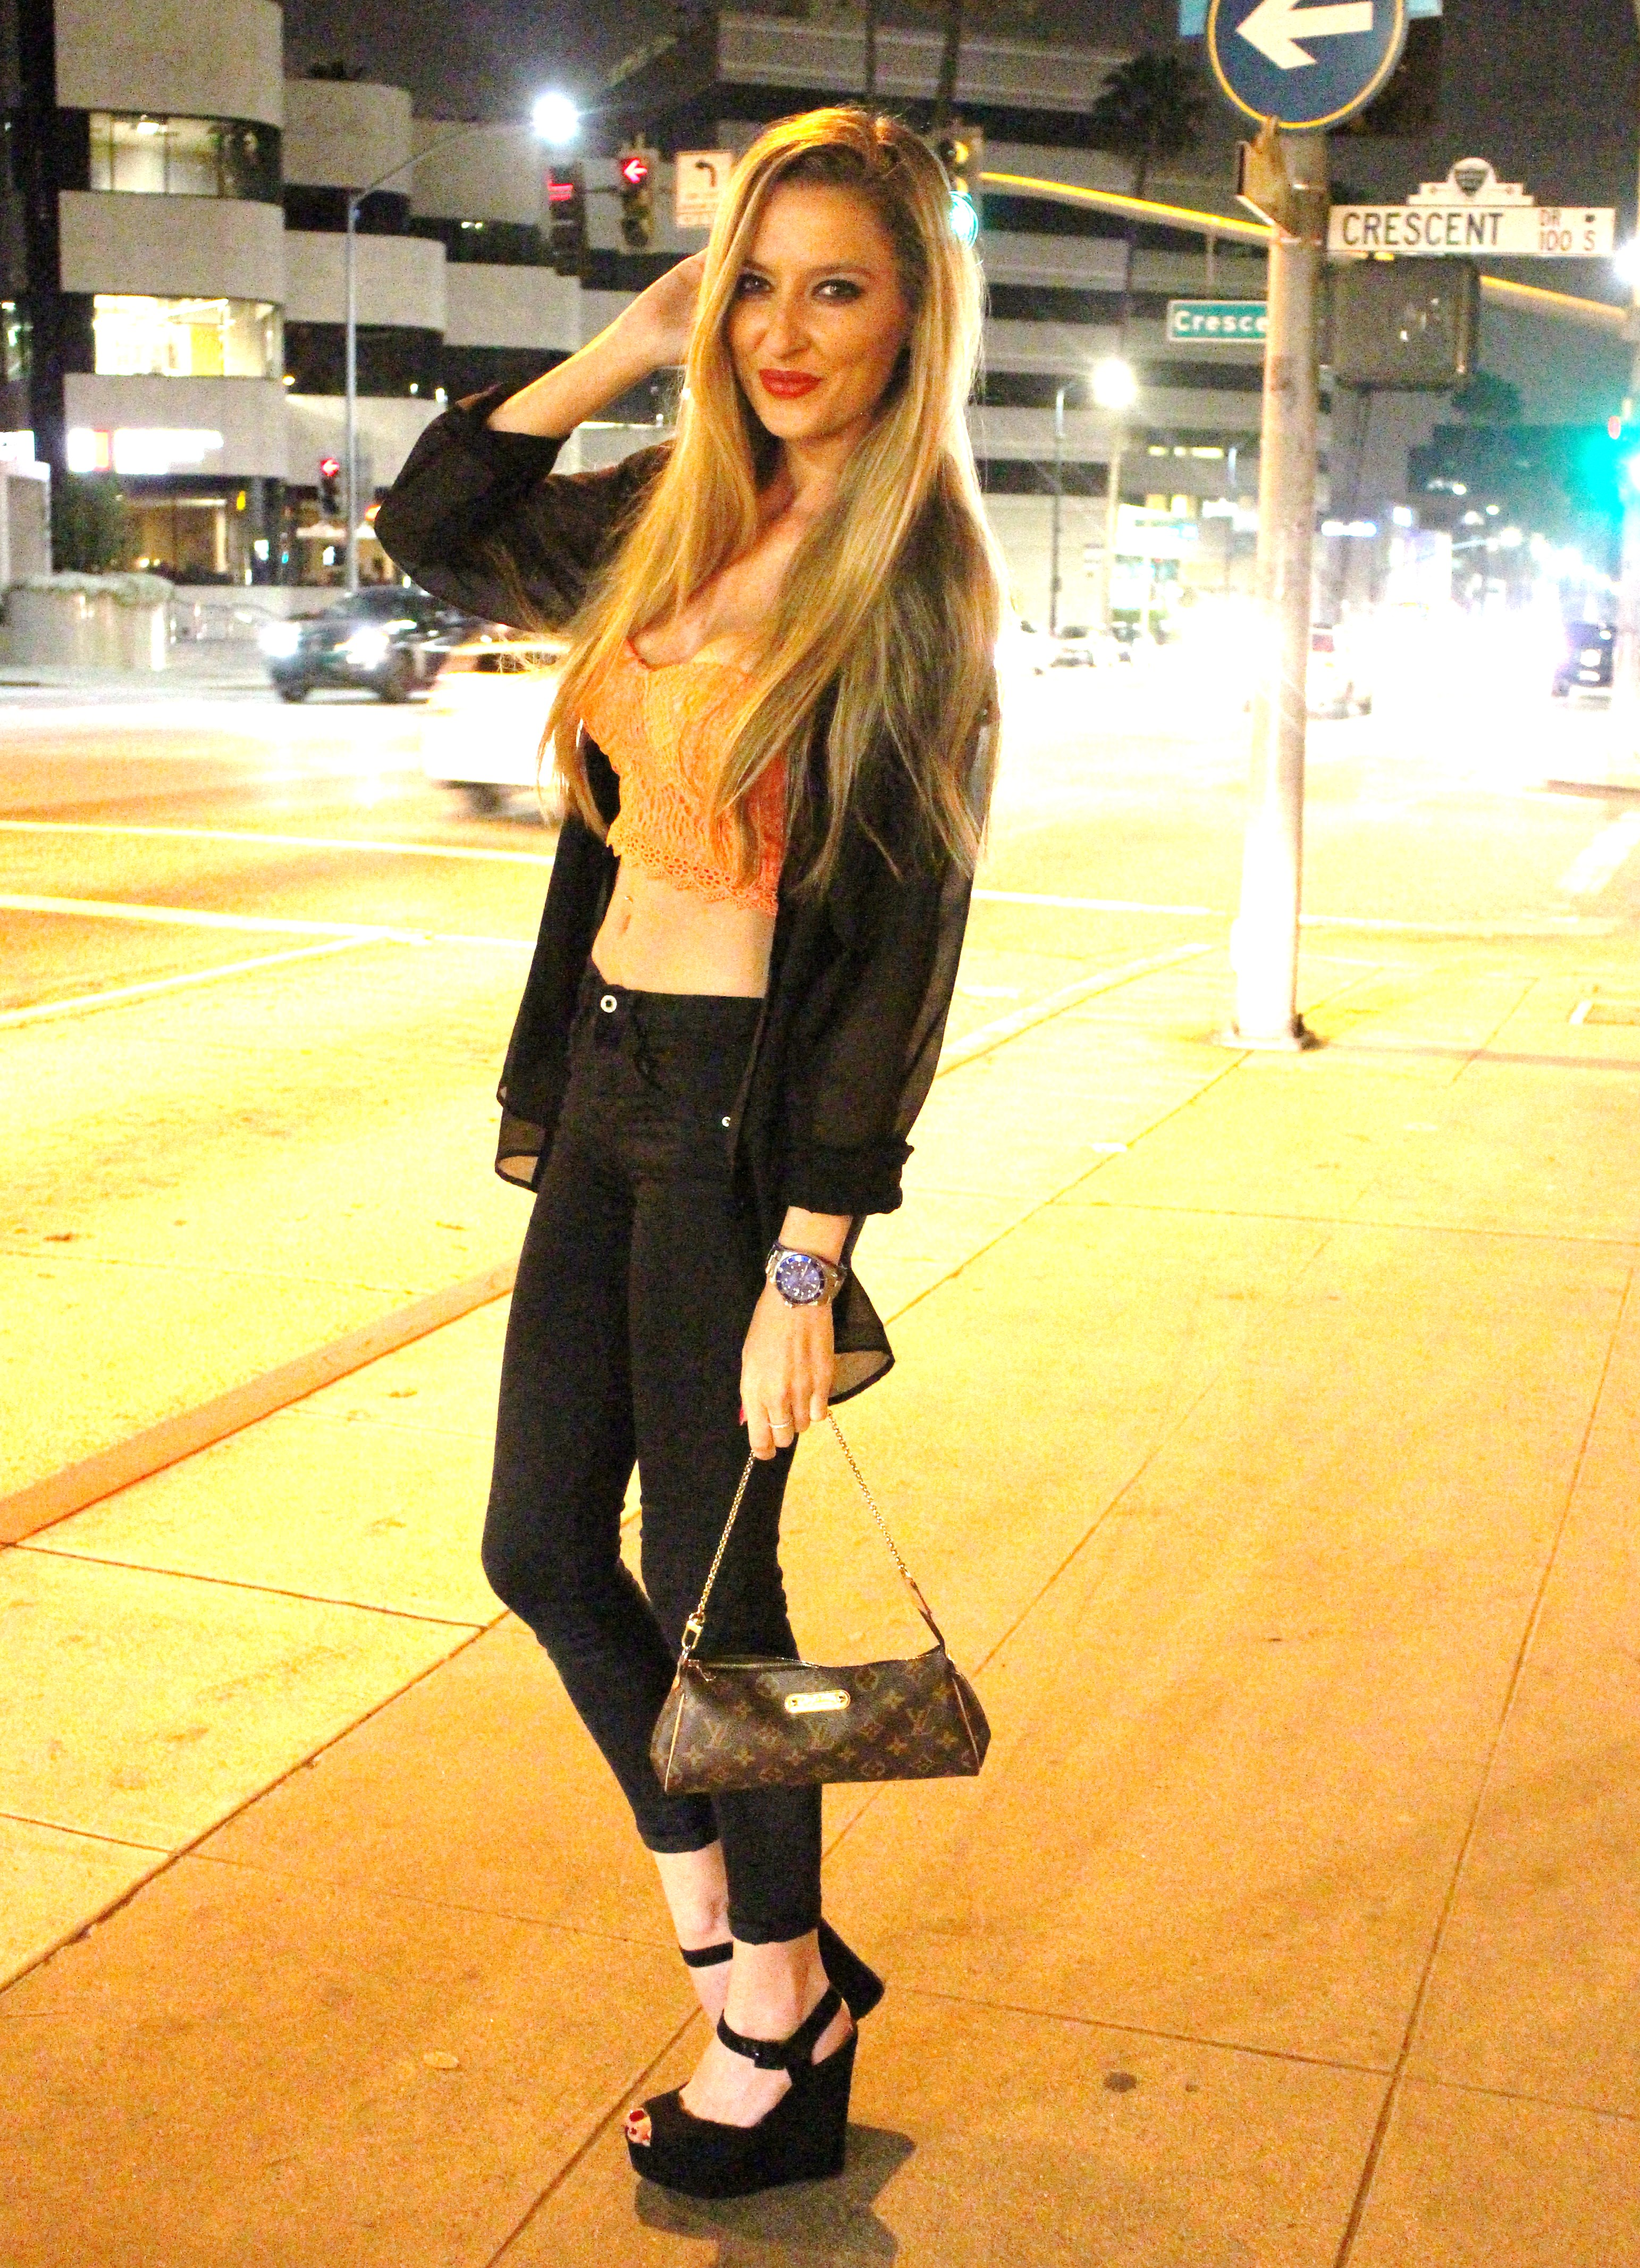 Black_Coral_Lights_Los_Angeles_Louis_Vuitton_Lara_Martin_Gilarranz_Bymyheels (4)